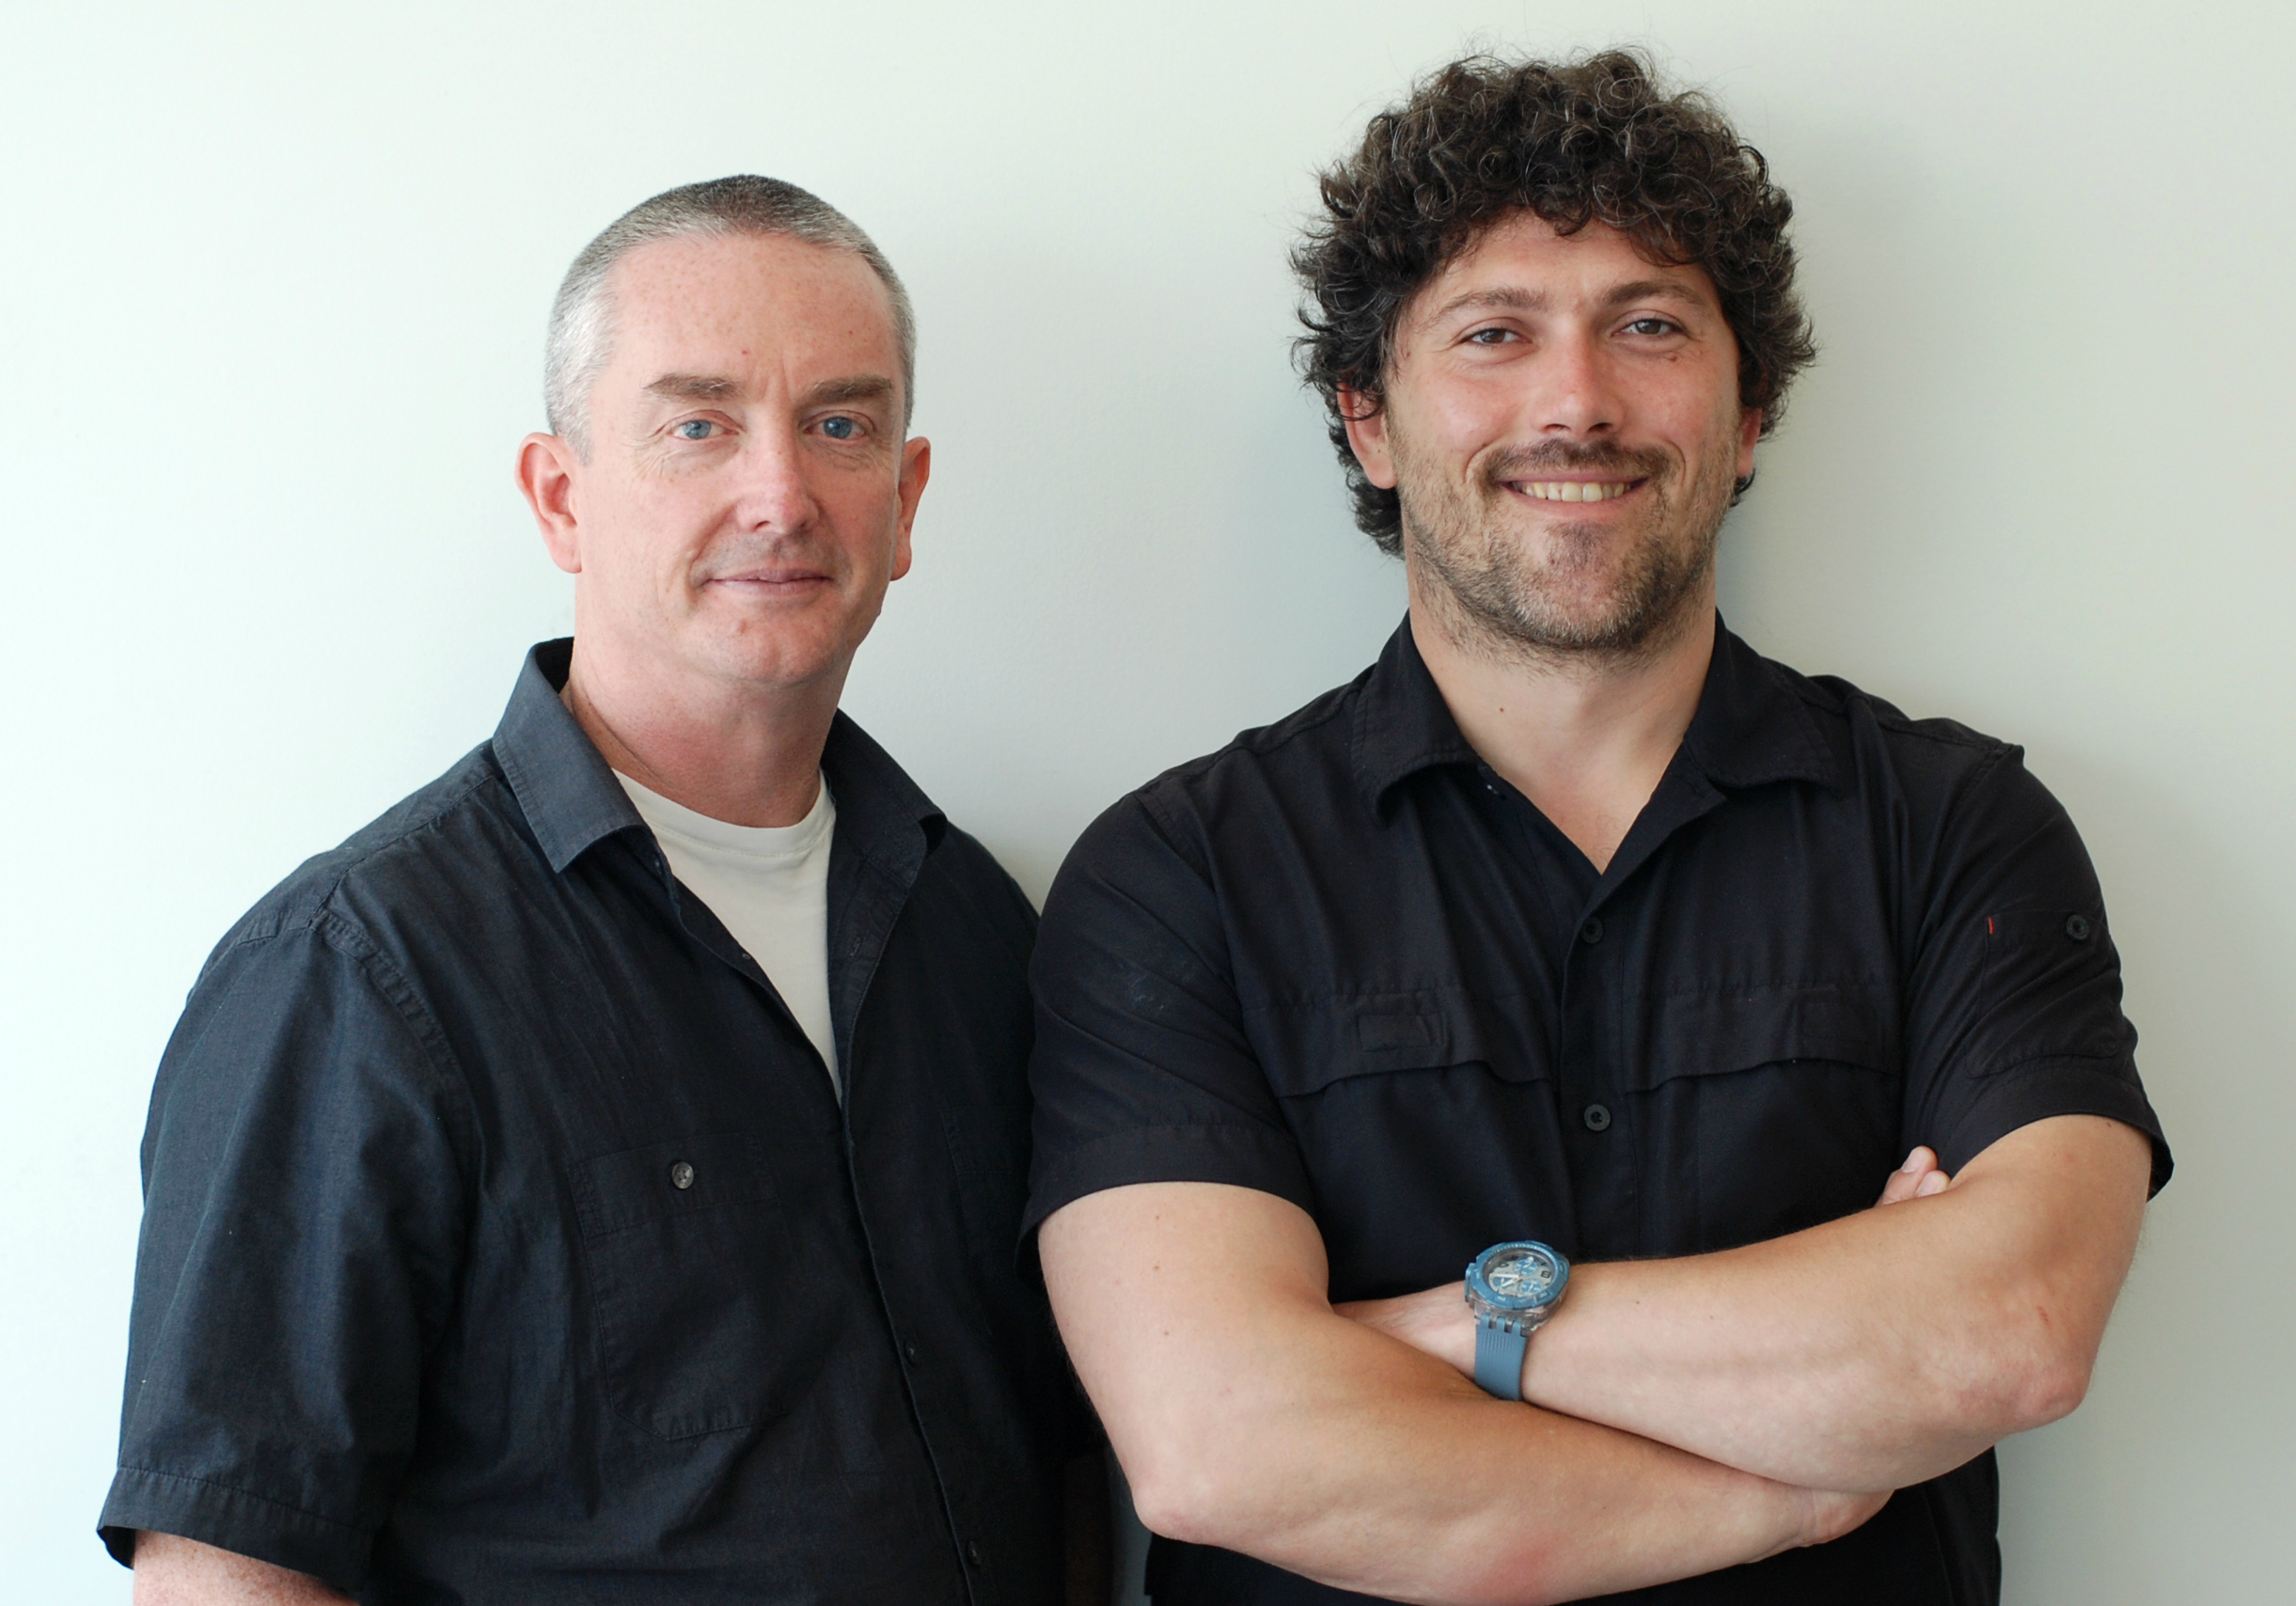 Christopher Hunter and Christoph Konradt